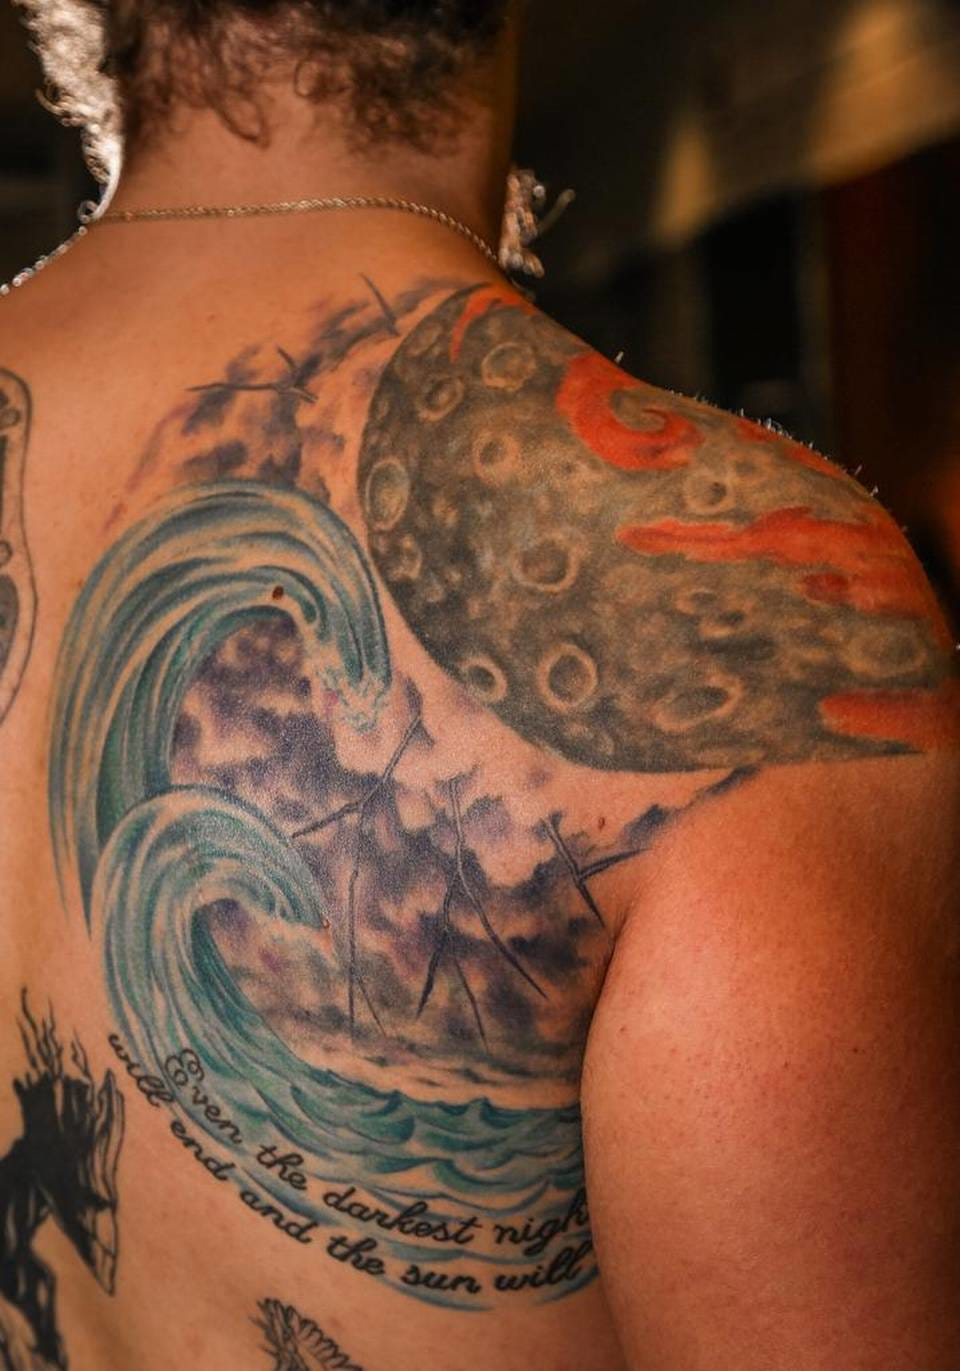 Matulis Has Some Creative Tattoos Covering His Torso!